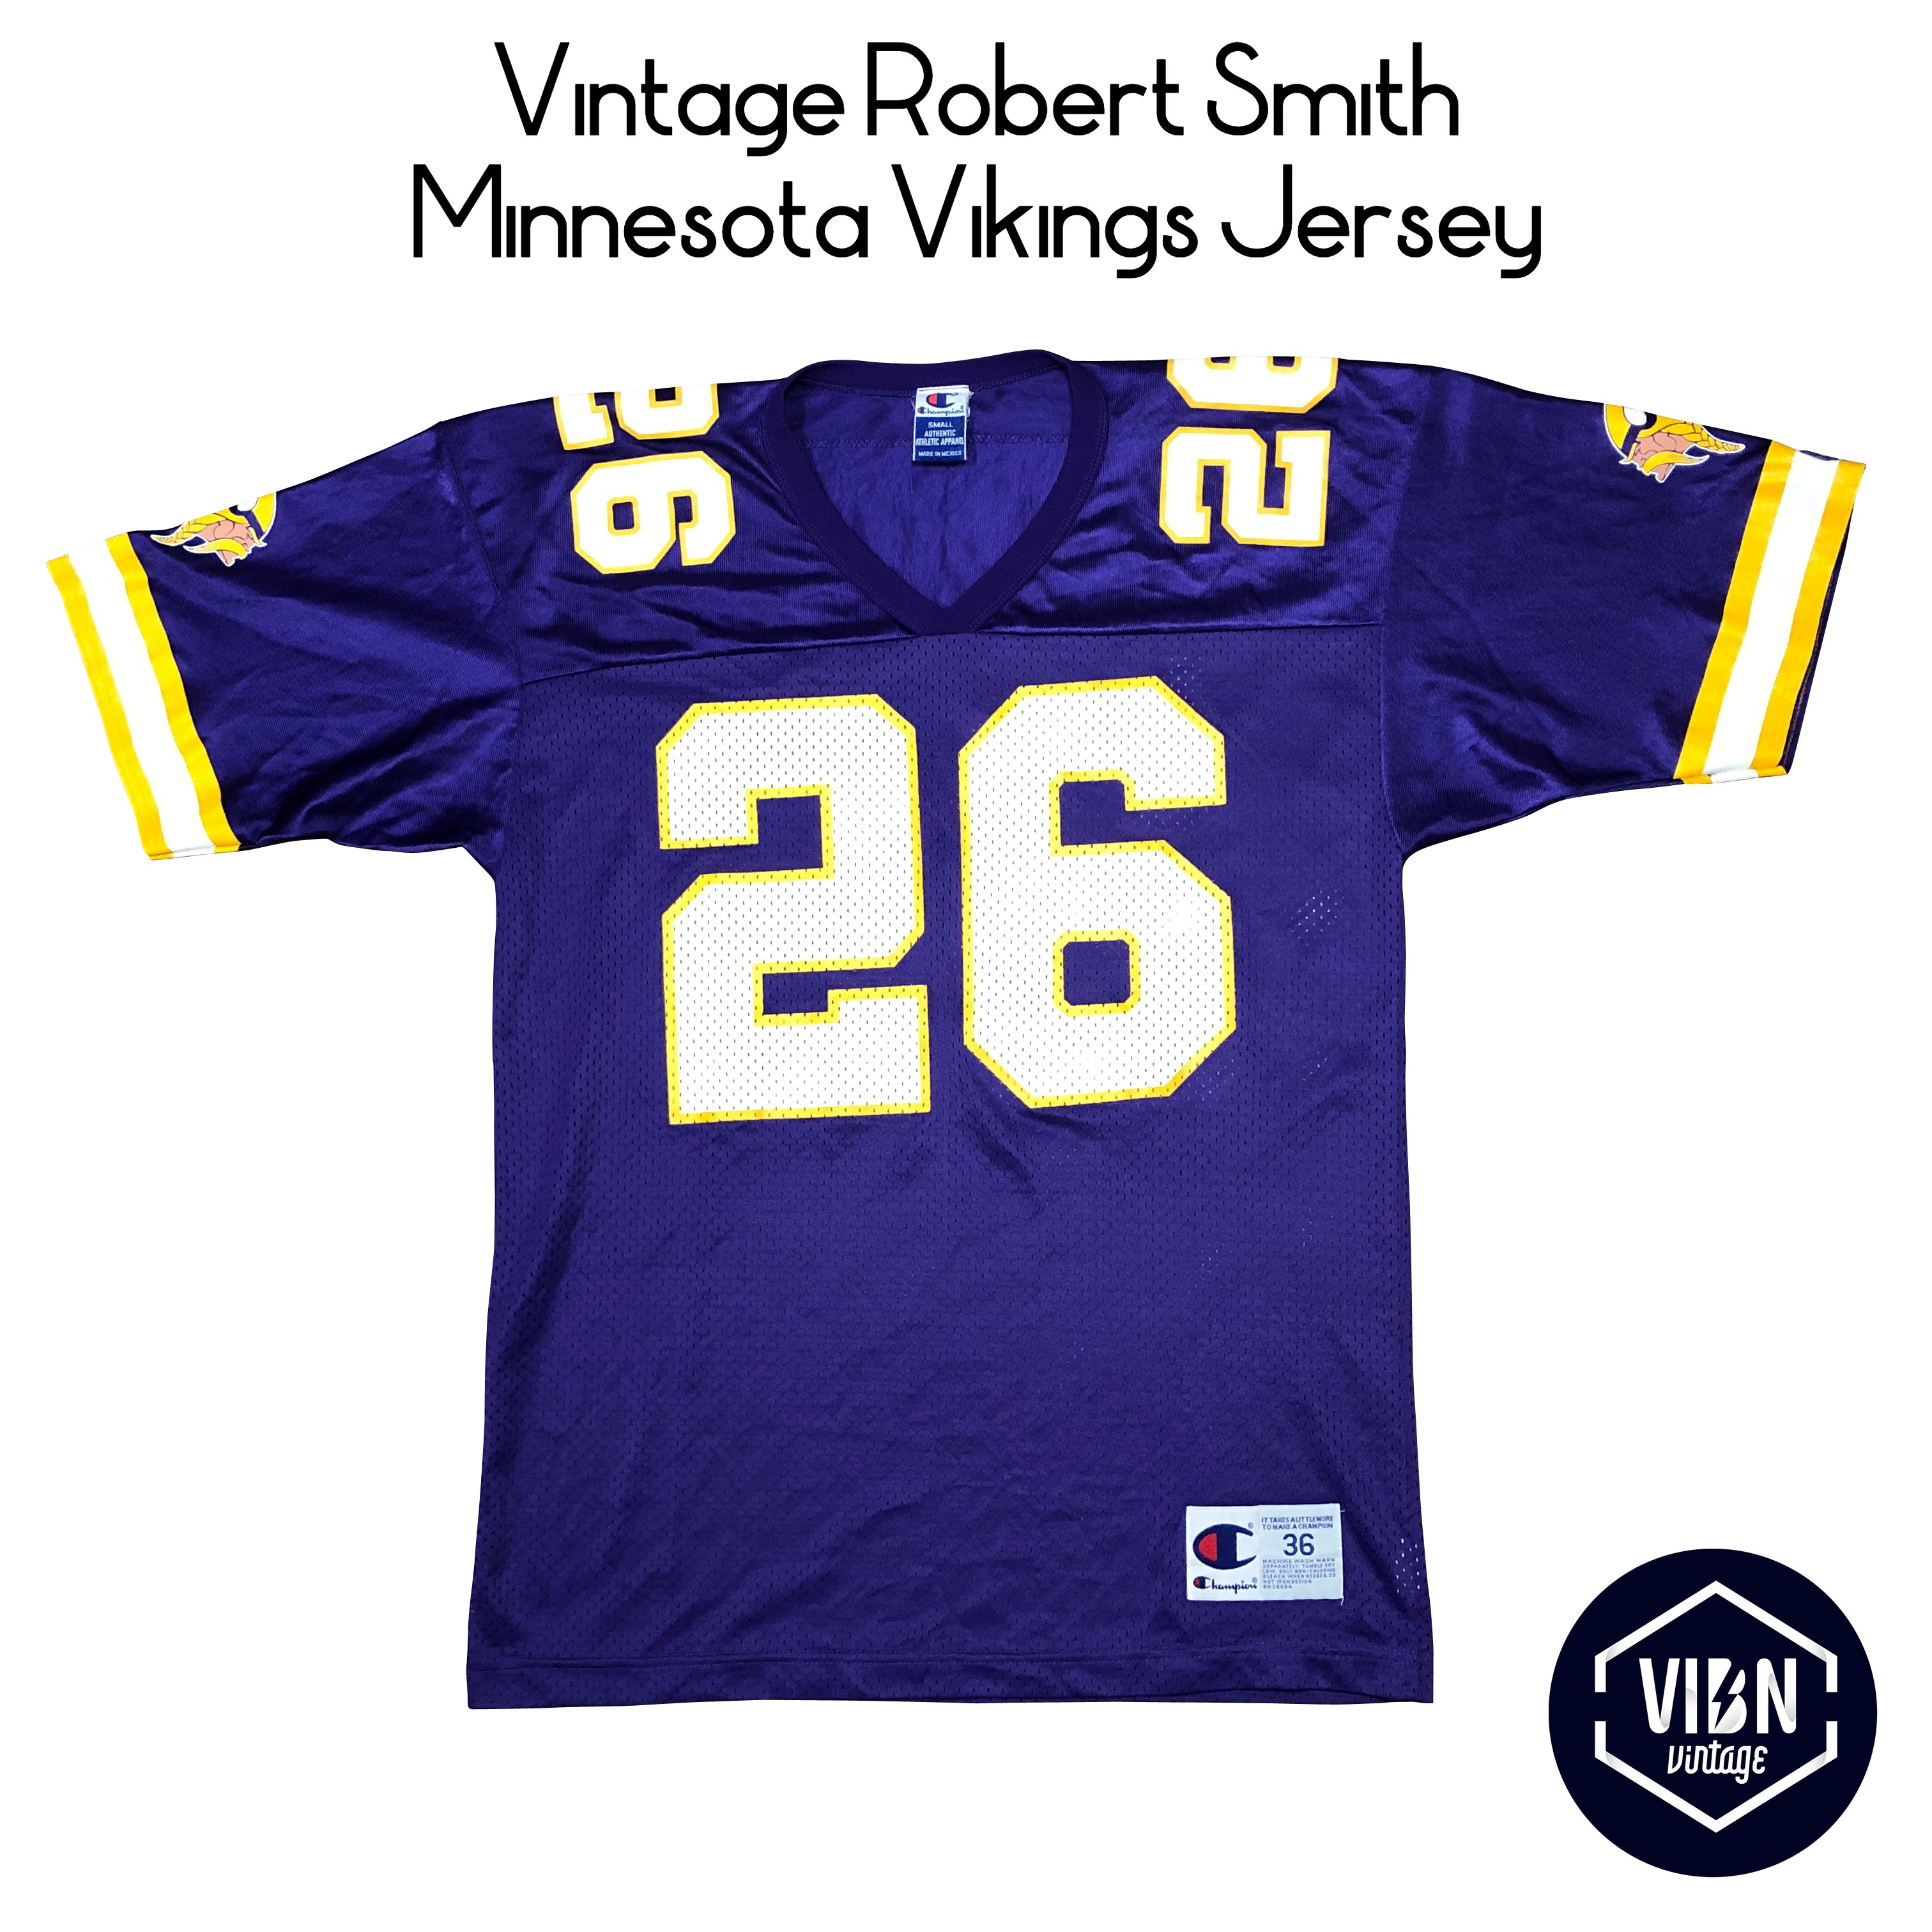 on sale a8051 a2e04 Vintage Robert Smith Minnesota Vikings Jersey